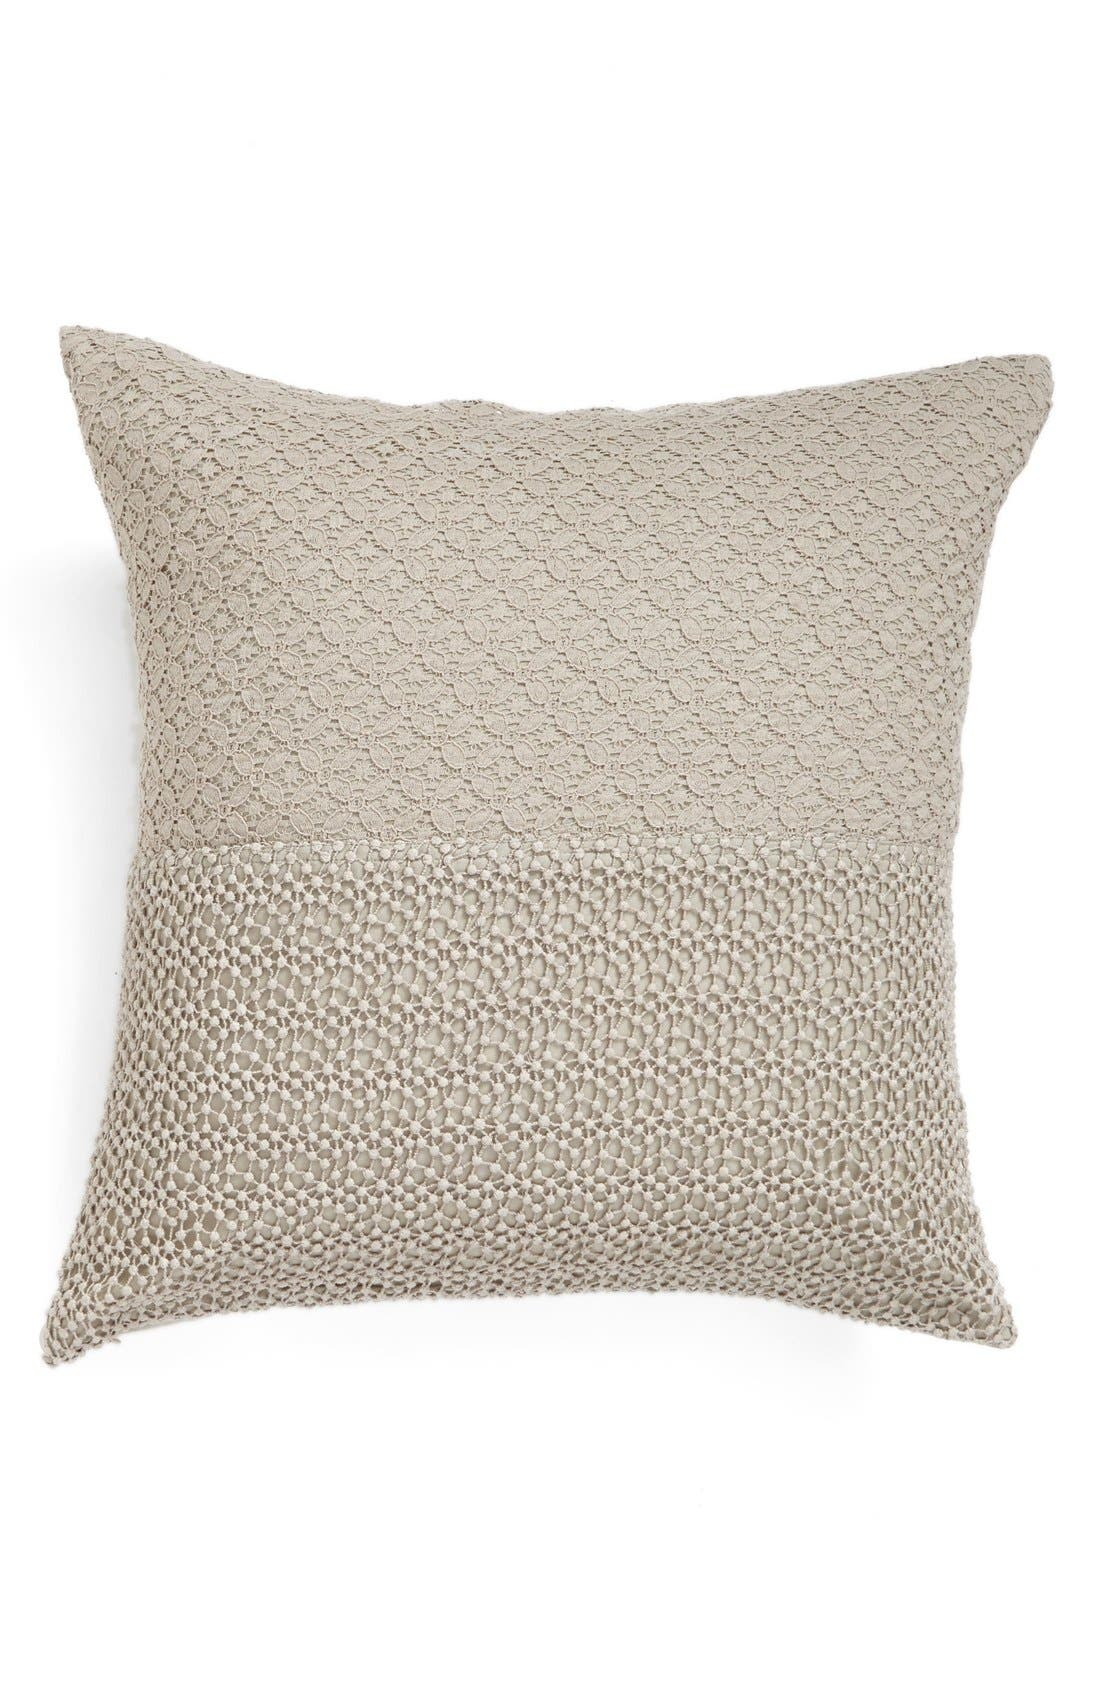 Main Image - Nordstrom at Home 'Maya' Lace Trim Pillow